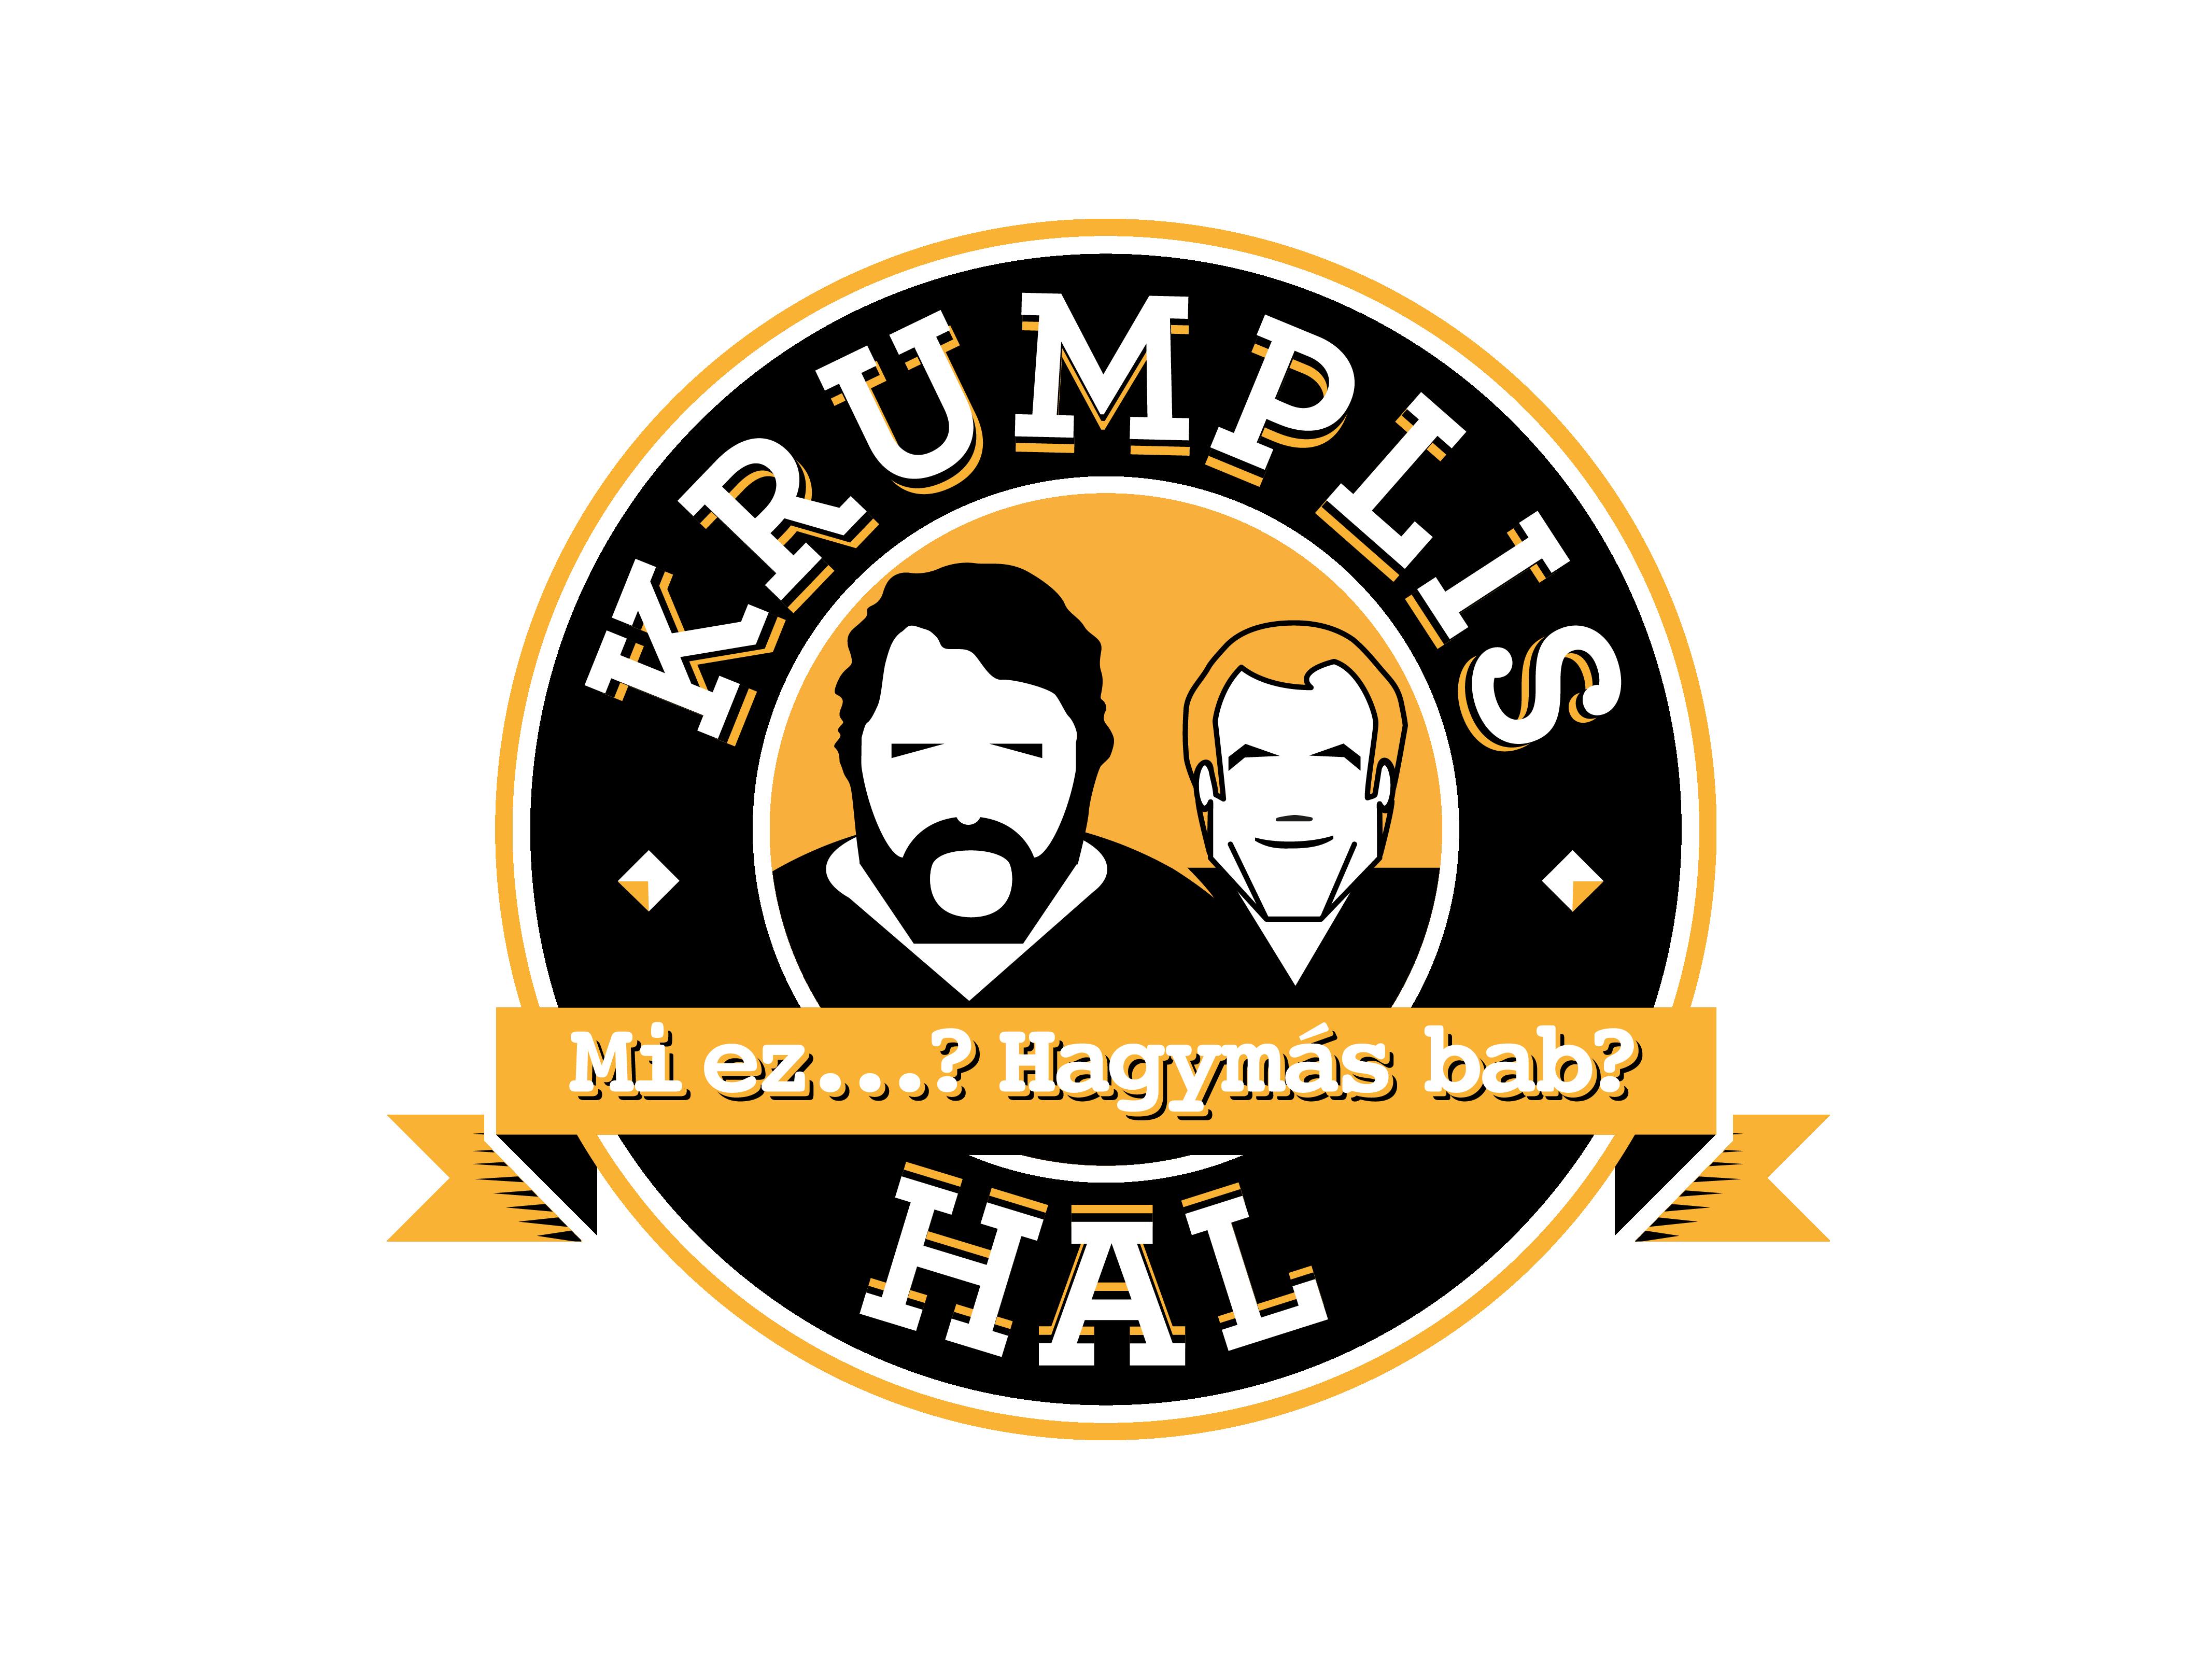 krumlishal-logo_final-2c-01.png